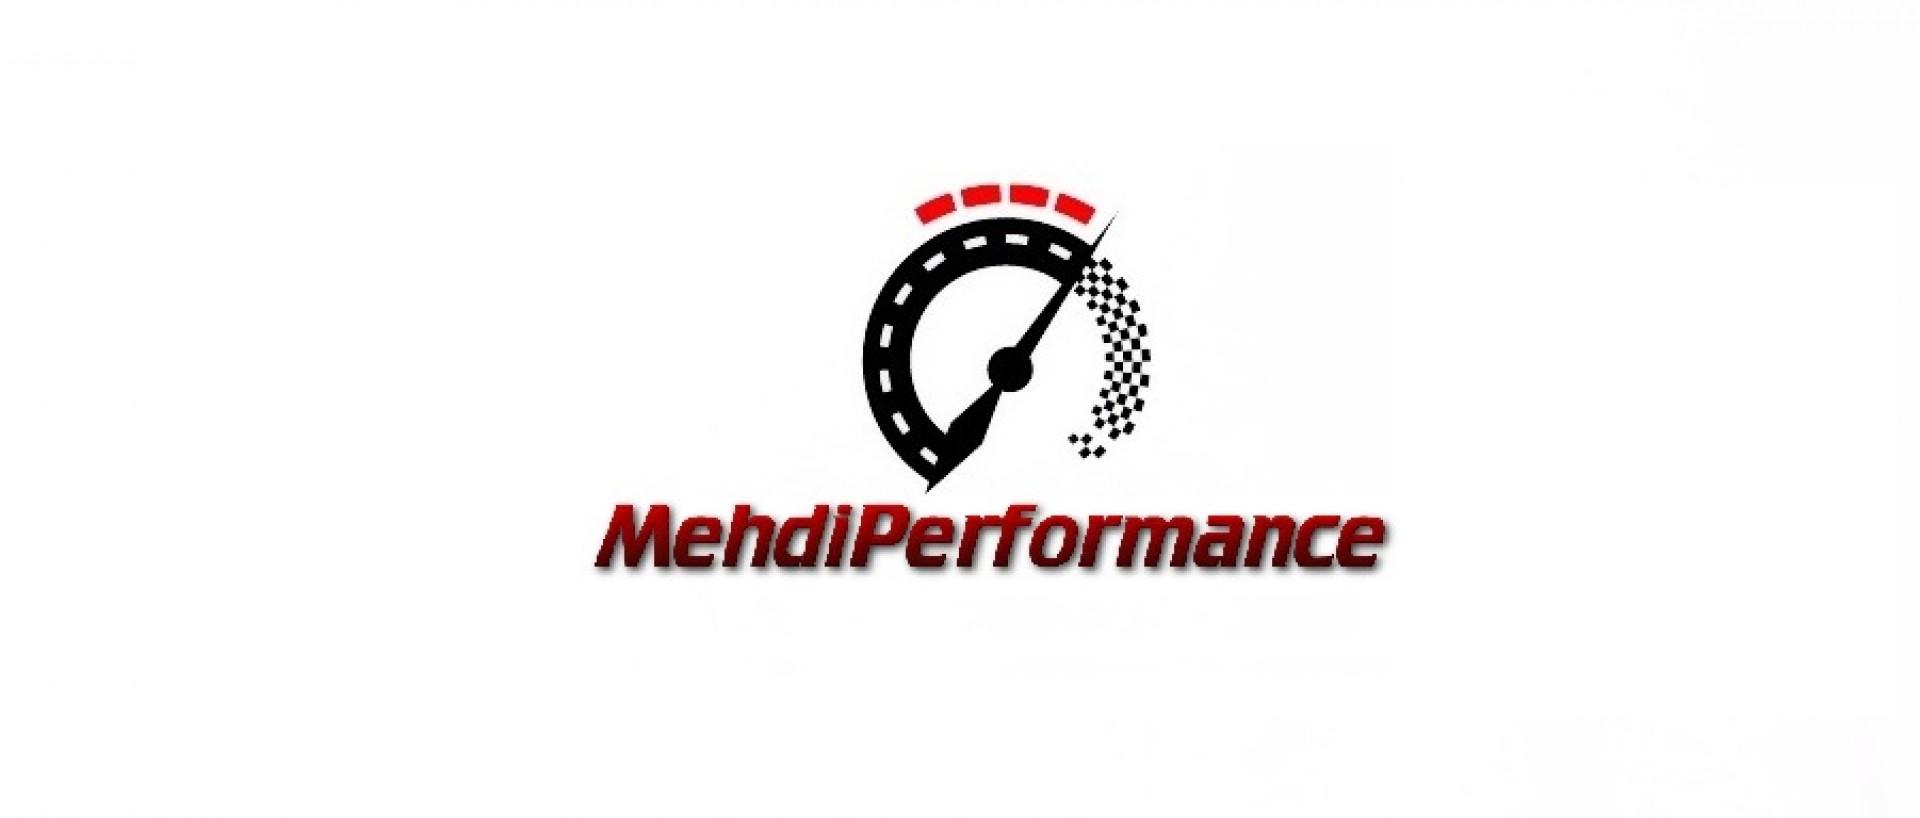 MehdiPerformance logo